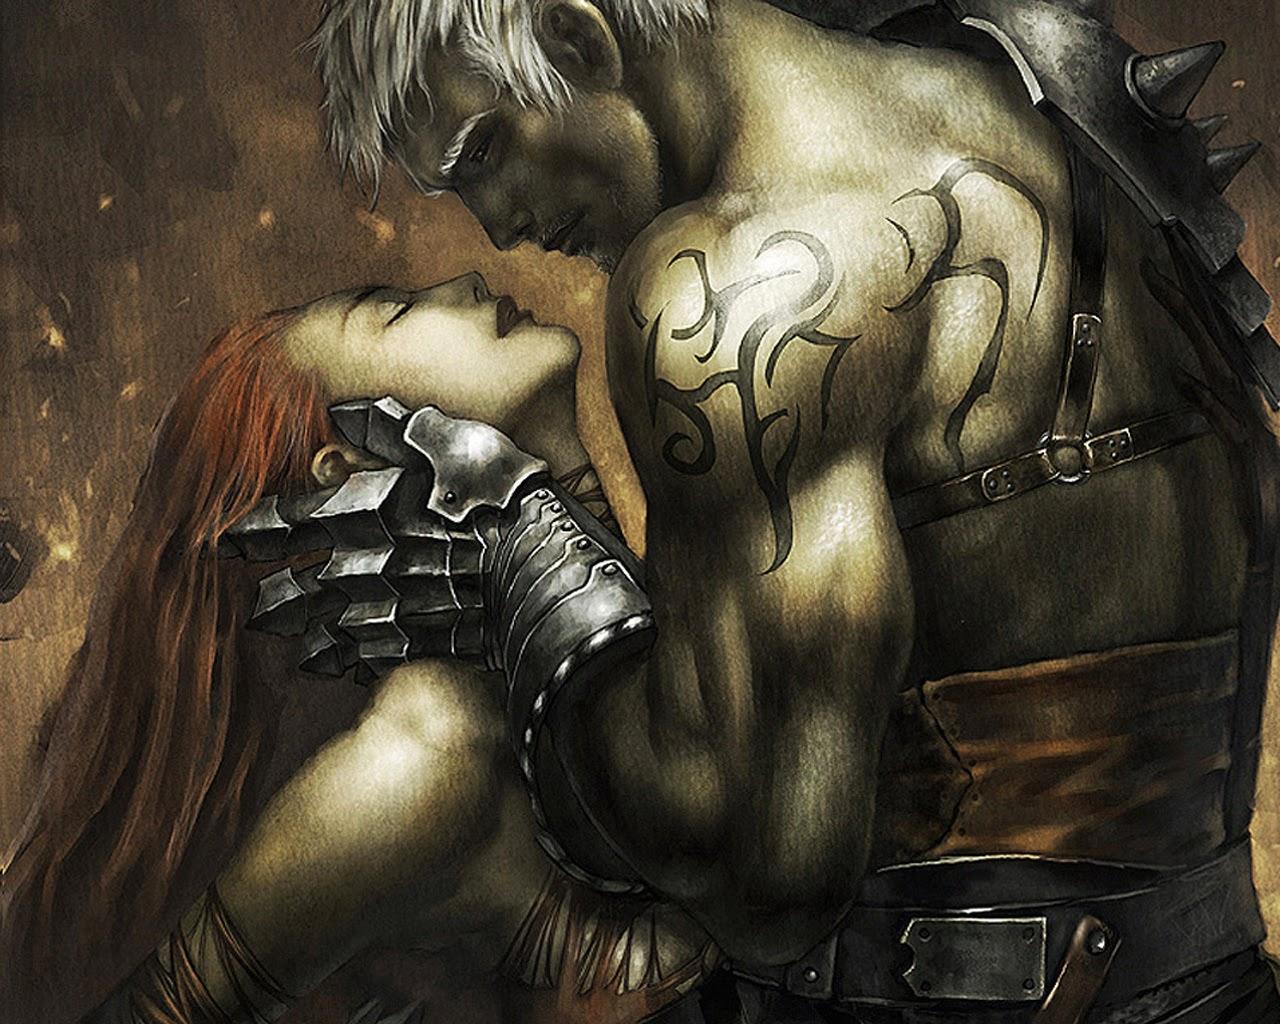 ¡¡ Oh l'amour !! - Página 2 Fantasy-Dark-